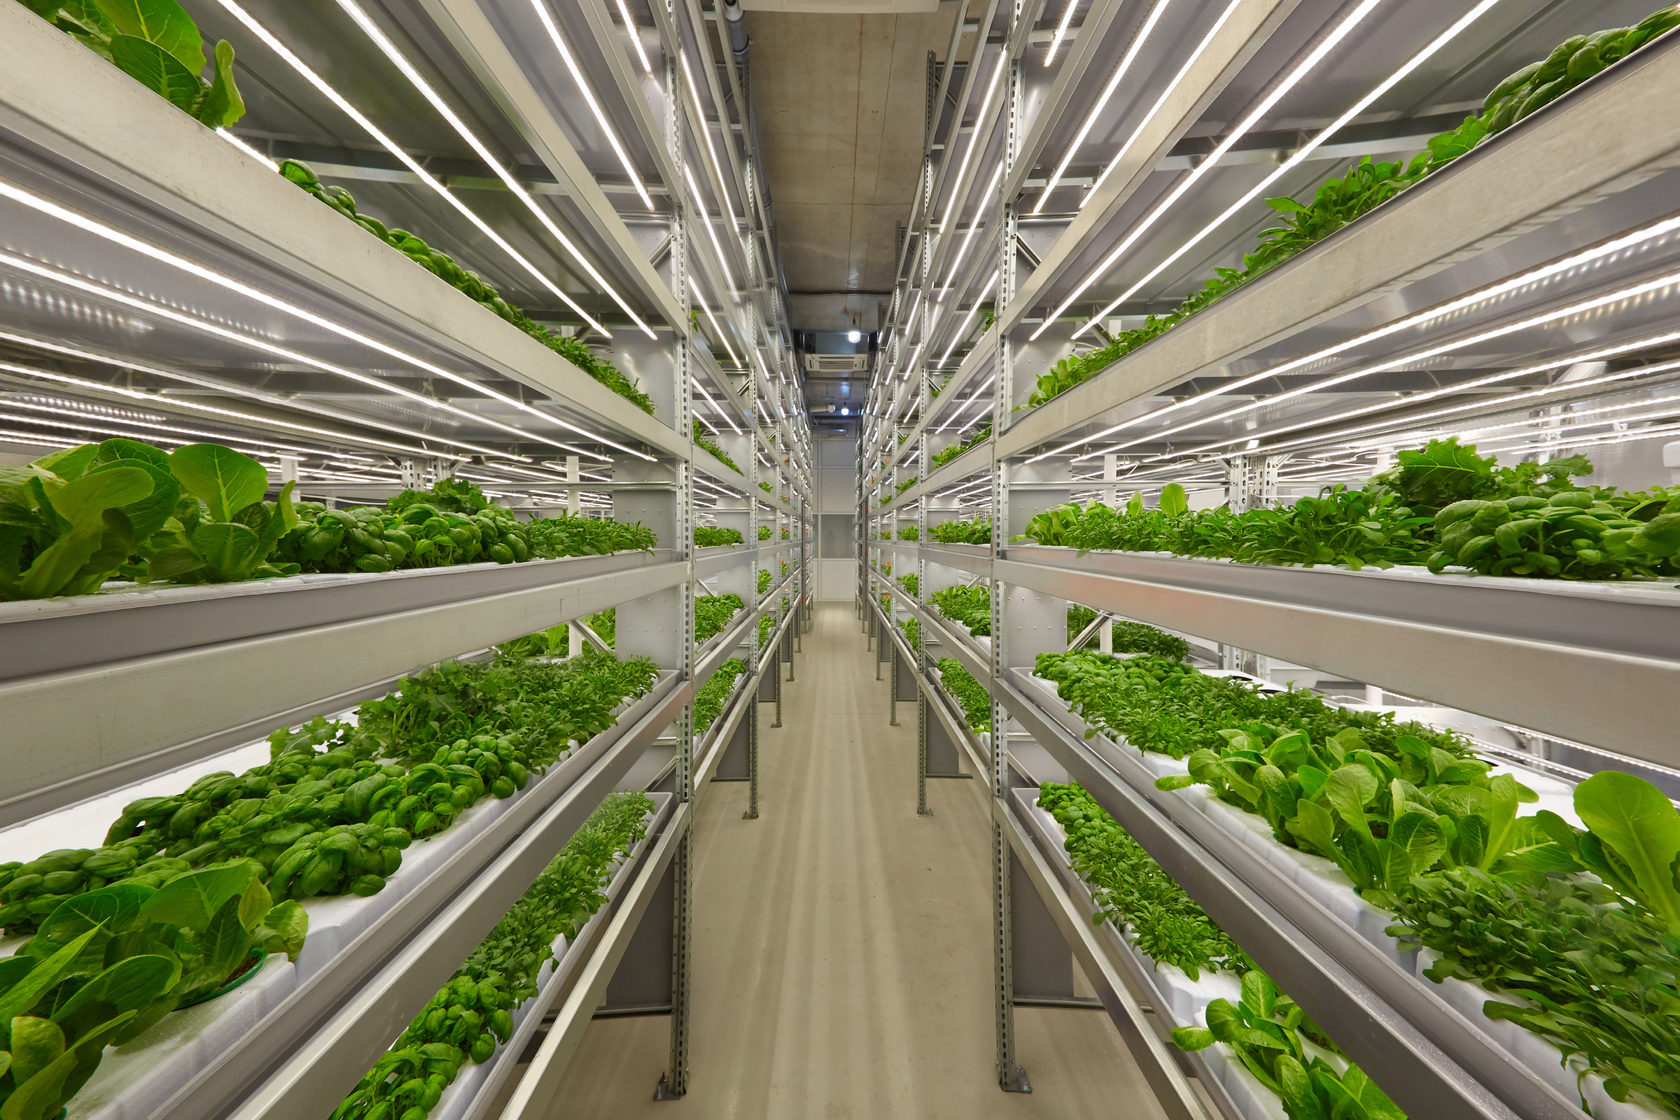 Vertical farm (salads), showroom Novosibirsk, Academgorodok